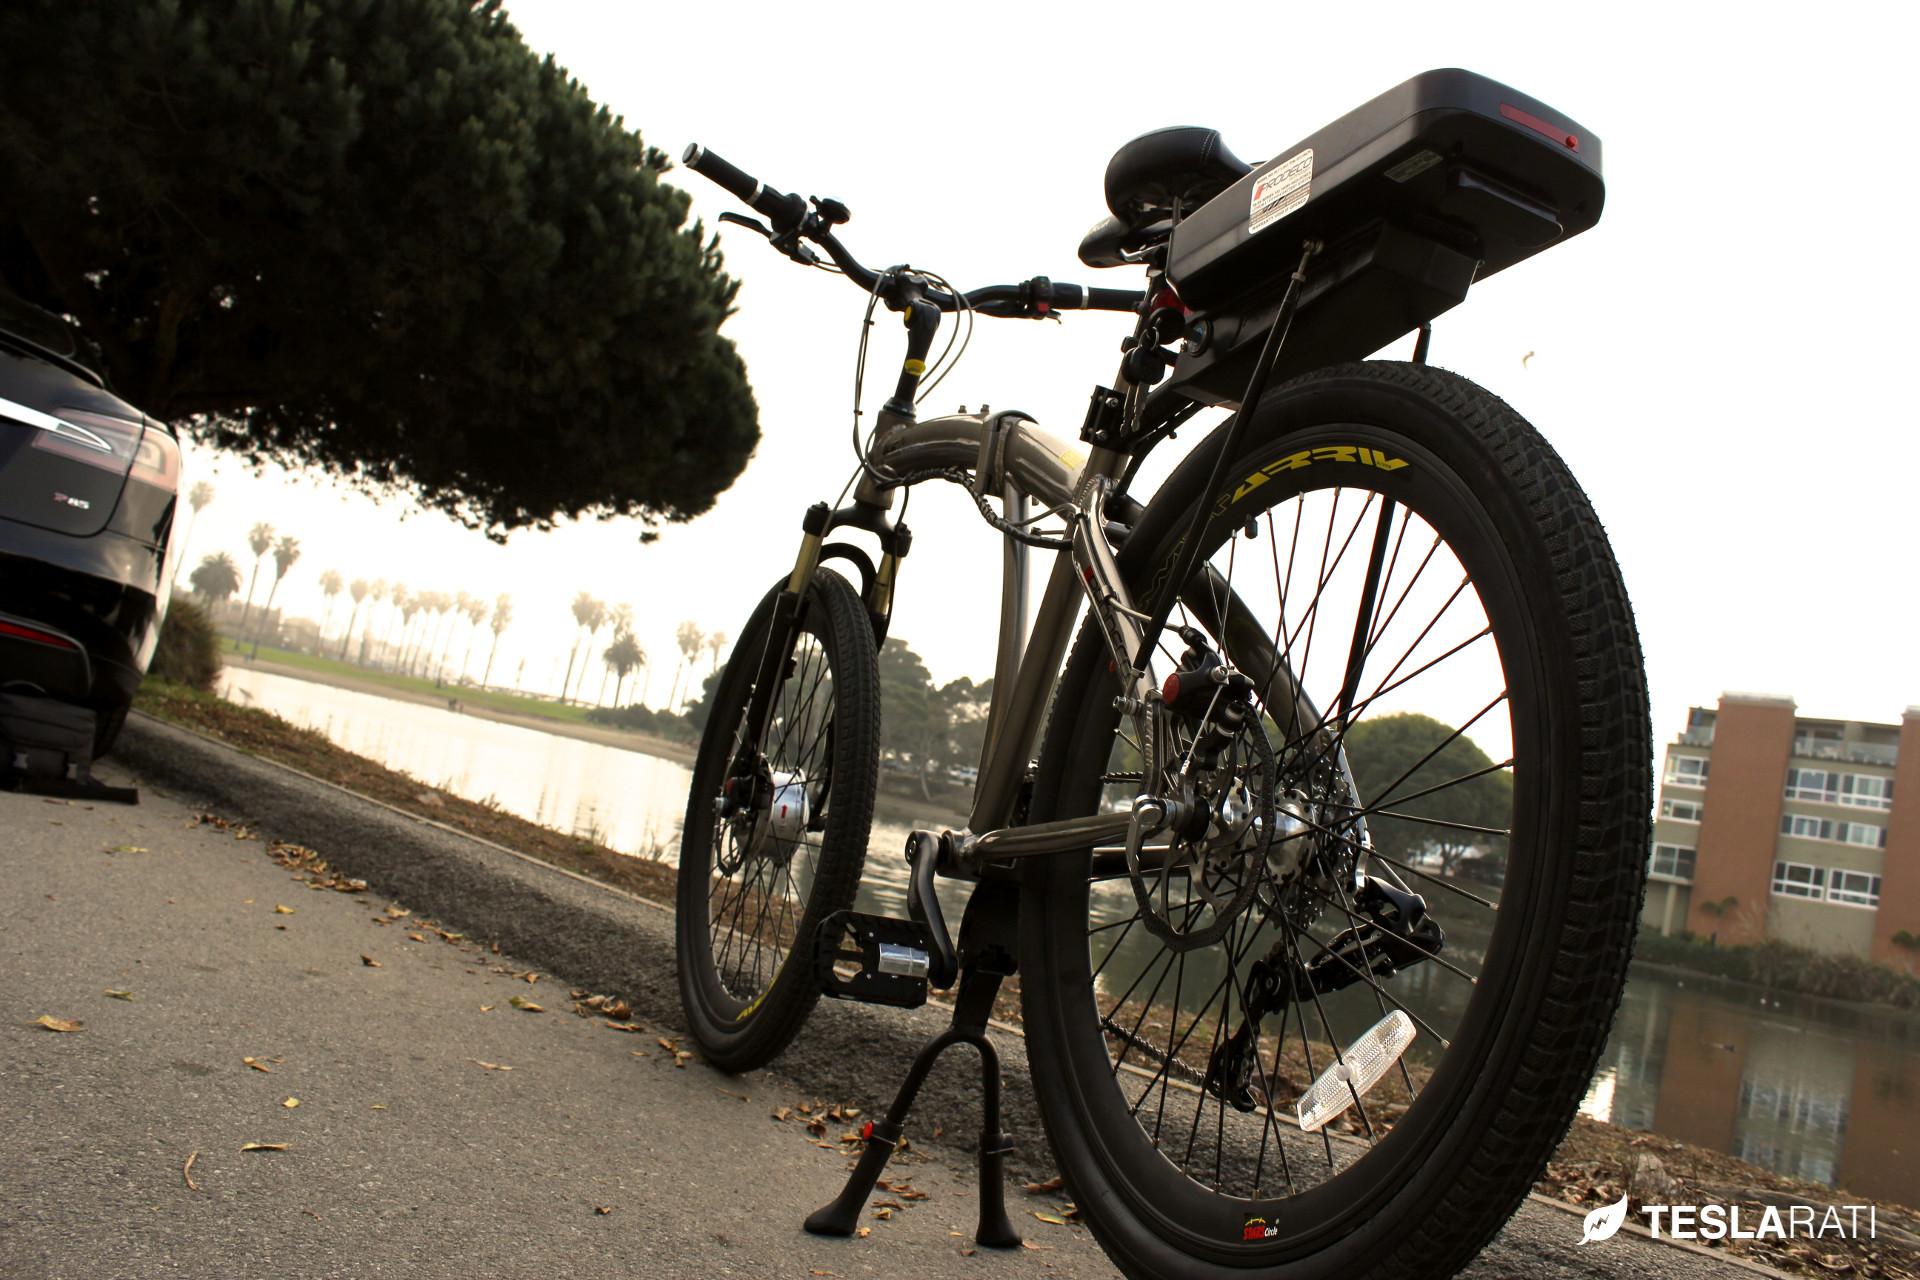 Tesla-Folding-Electric-Bike-Prodeco-2